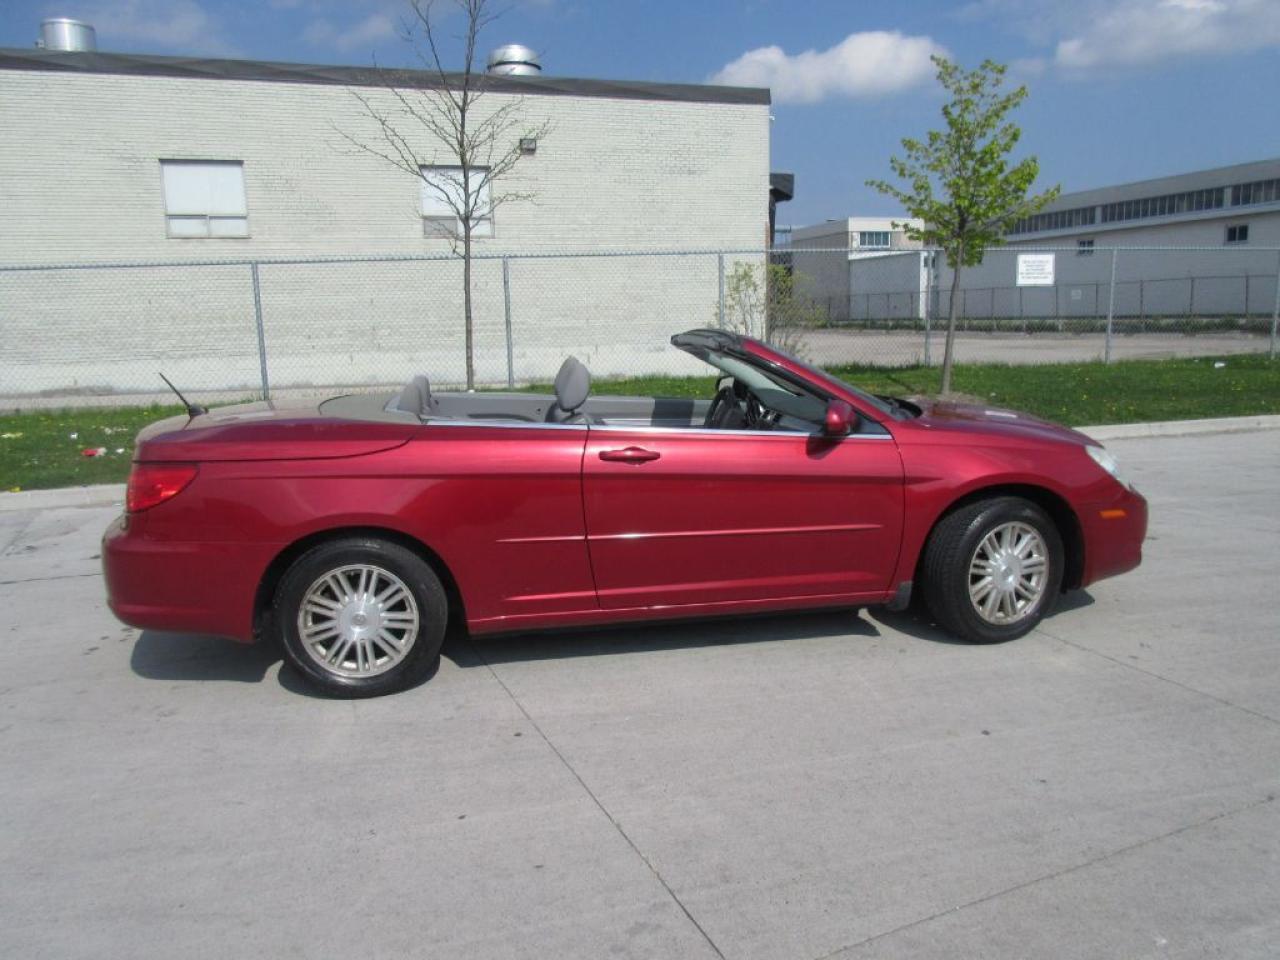 Photo of Red 2008 Chrysler Sebring convertible, 2 Door, certified, 3 years warranty a